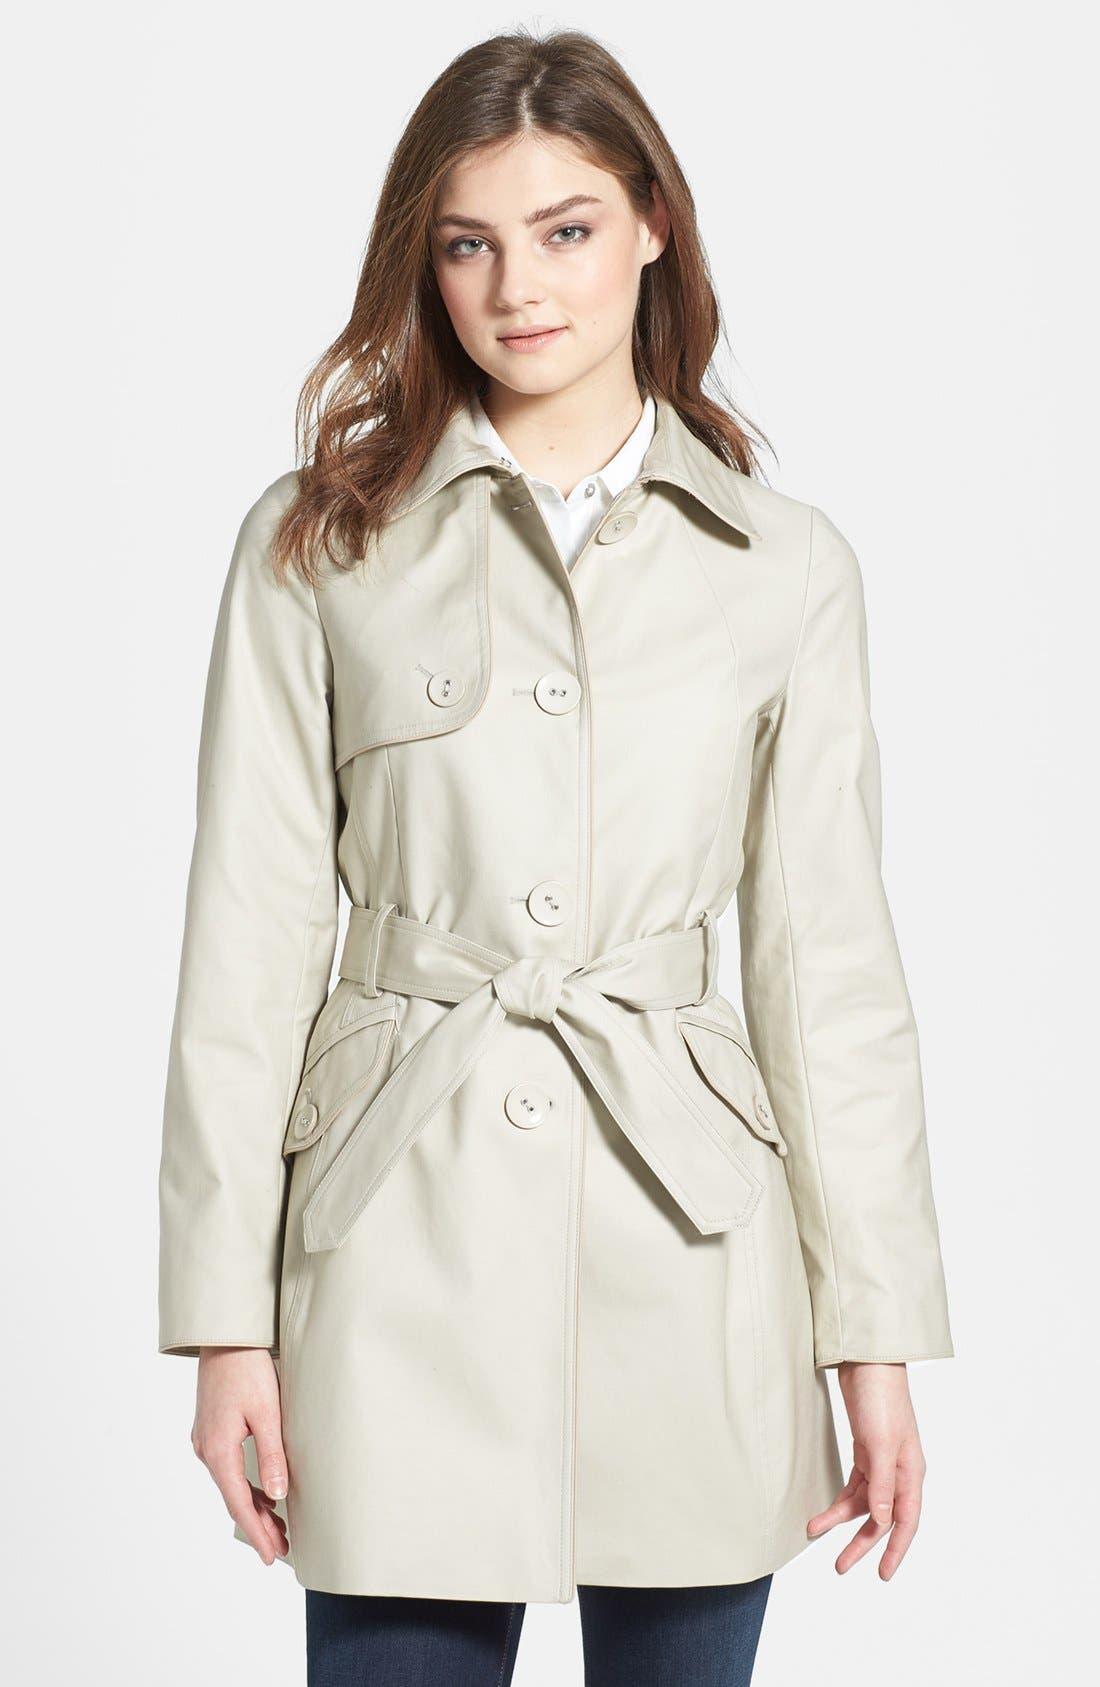 Alternate Image 1 Selected - Kristen Blake Piped Stretch Cotton Trench Coat (Regular & Petite)